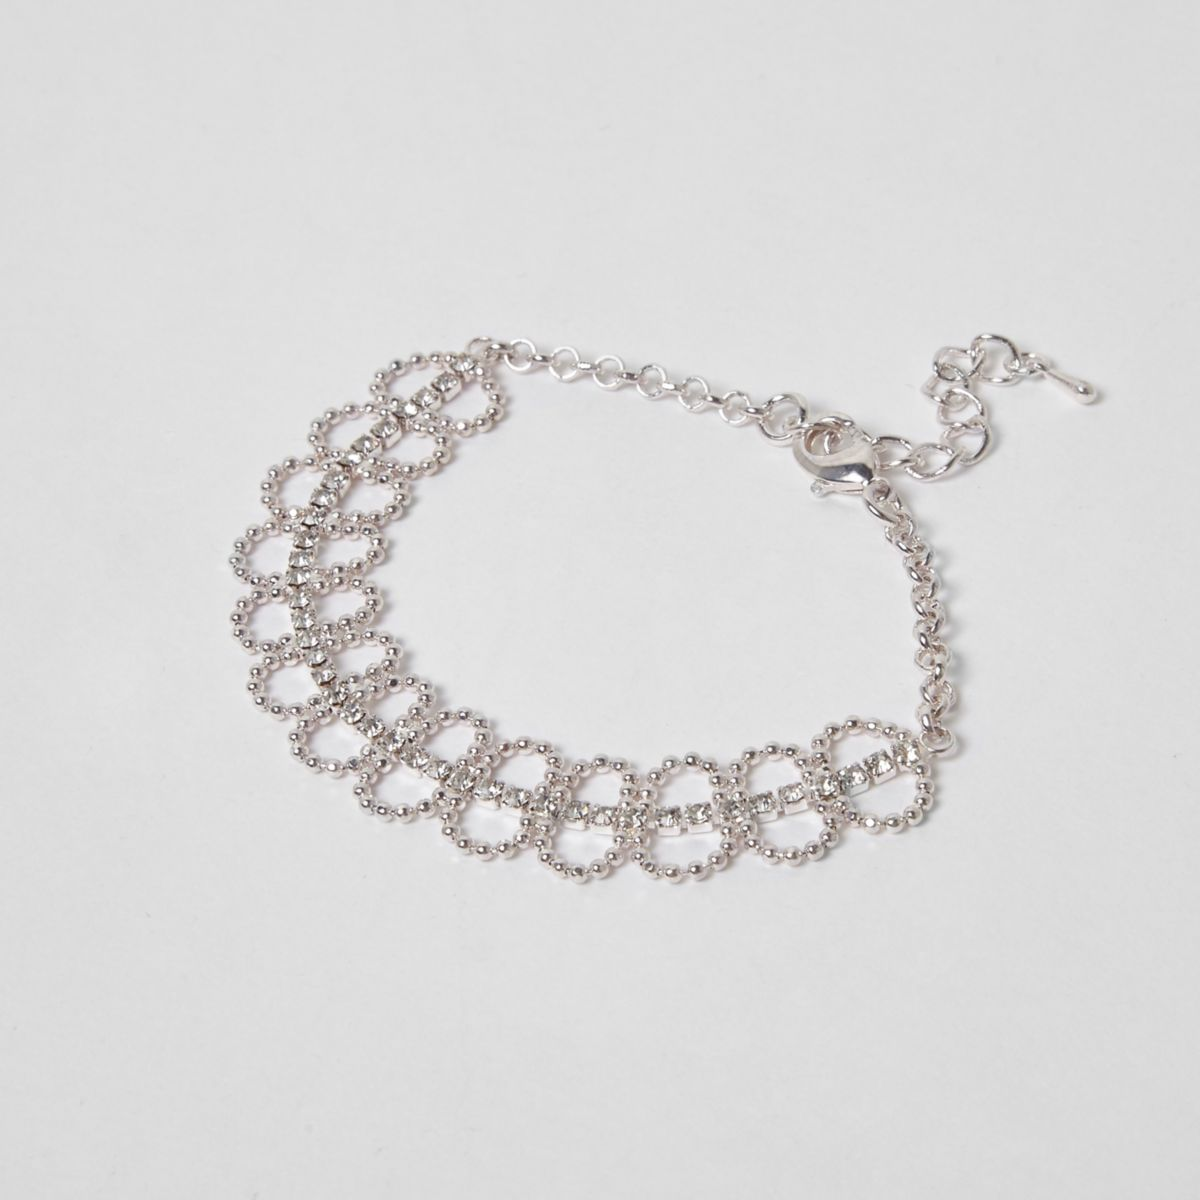 Silver tone pave ball bracelet